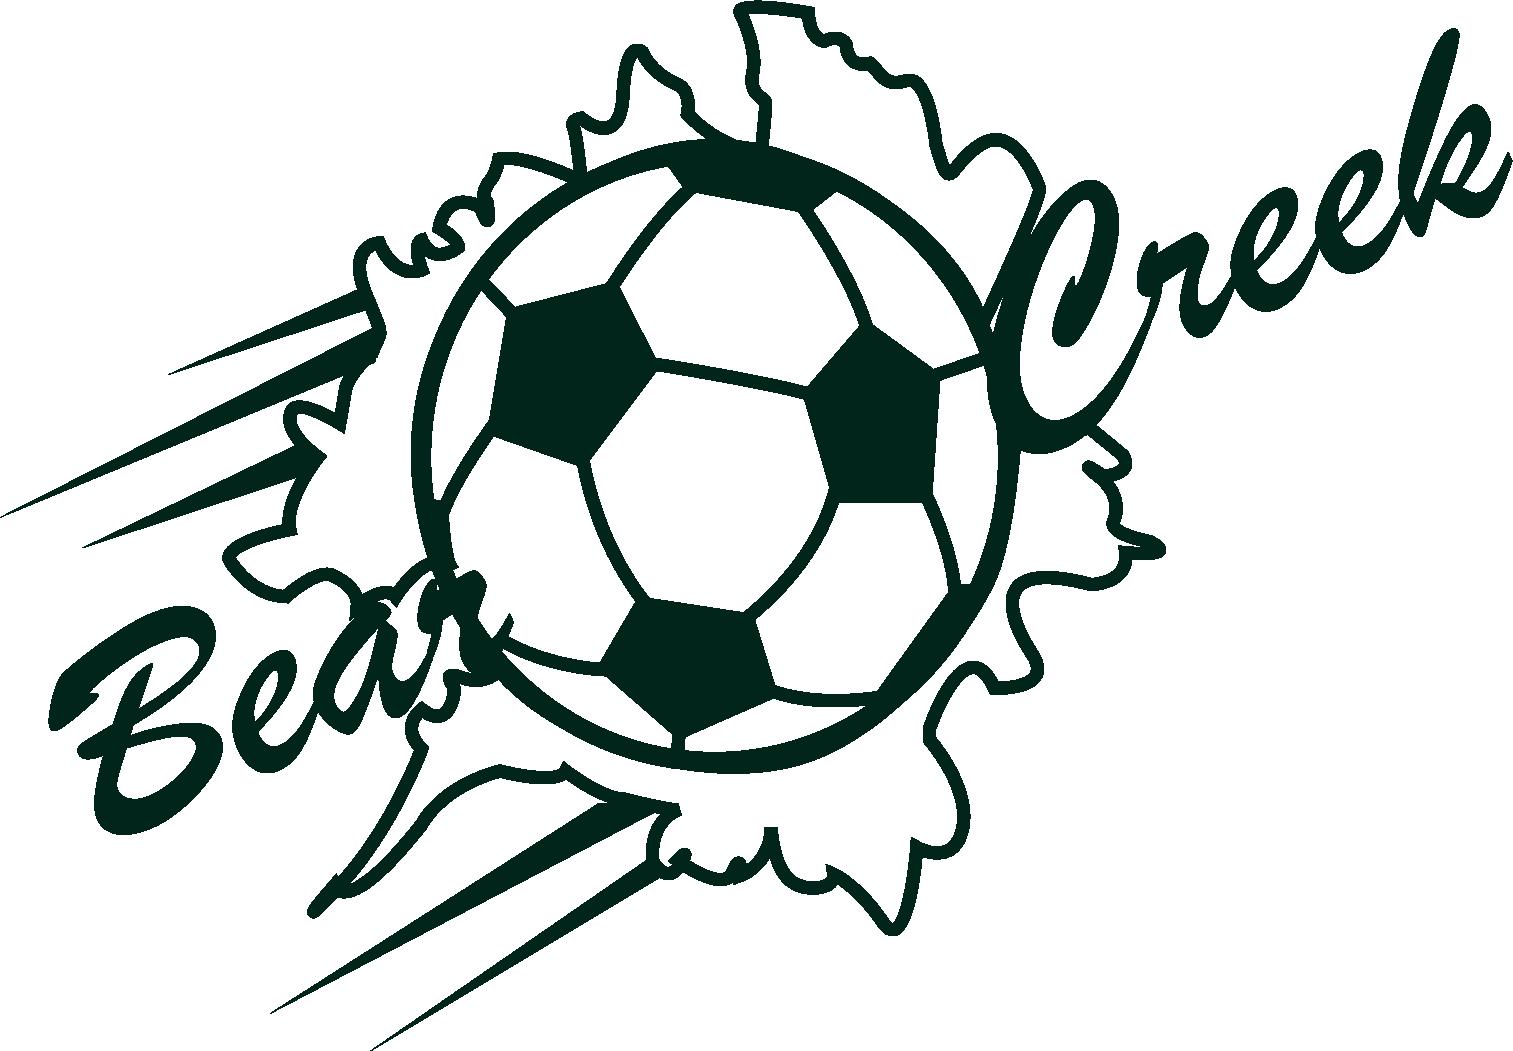 bear-creek-sc header logo2